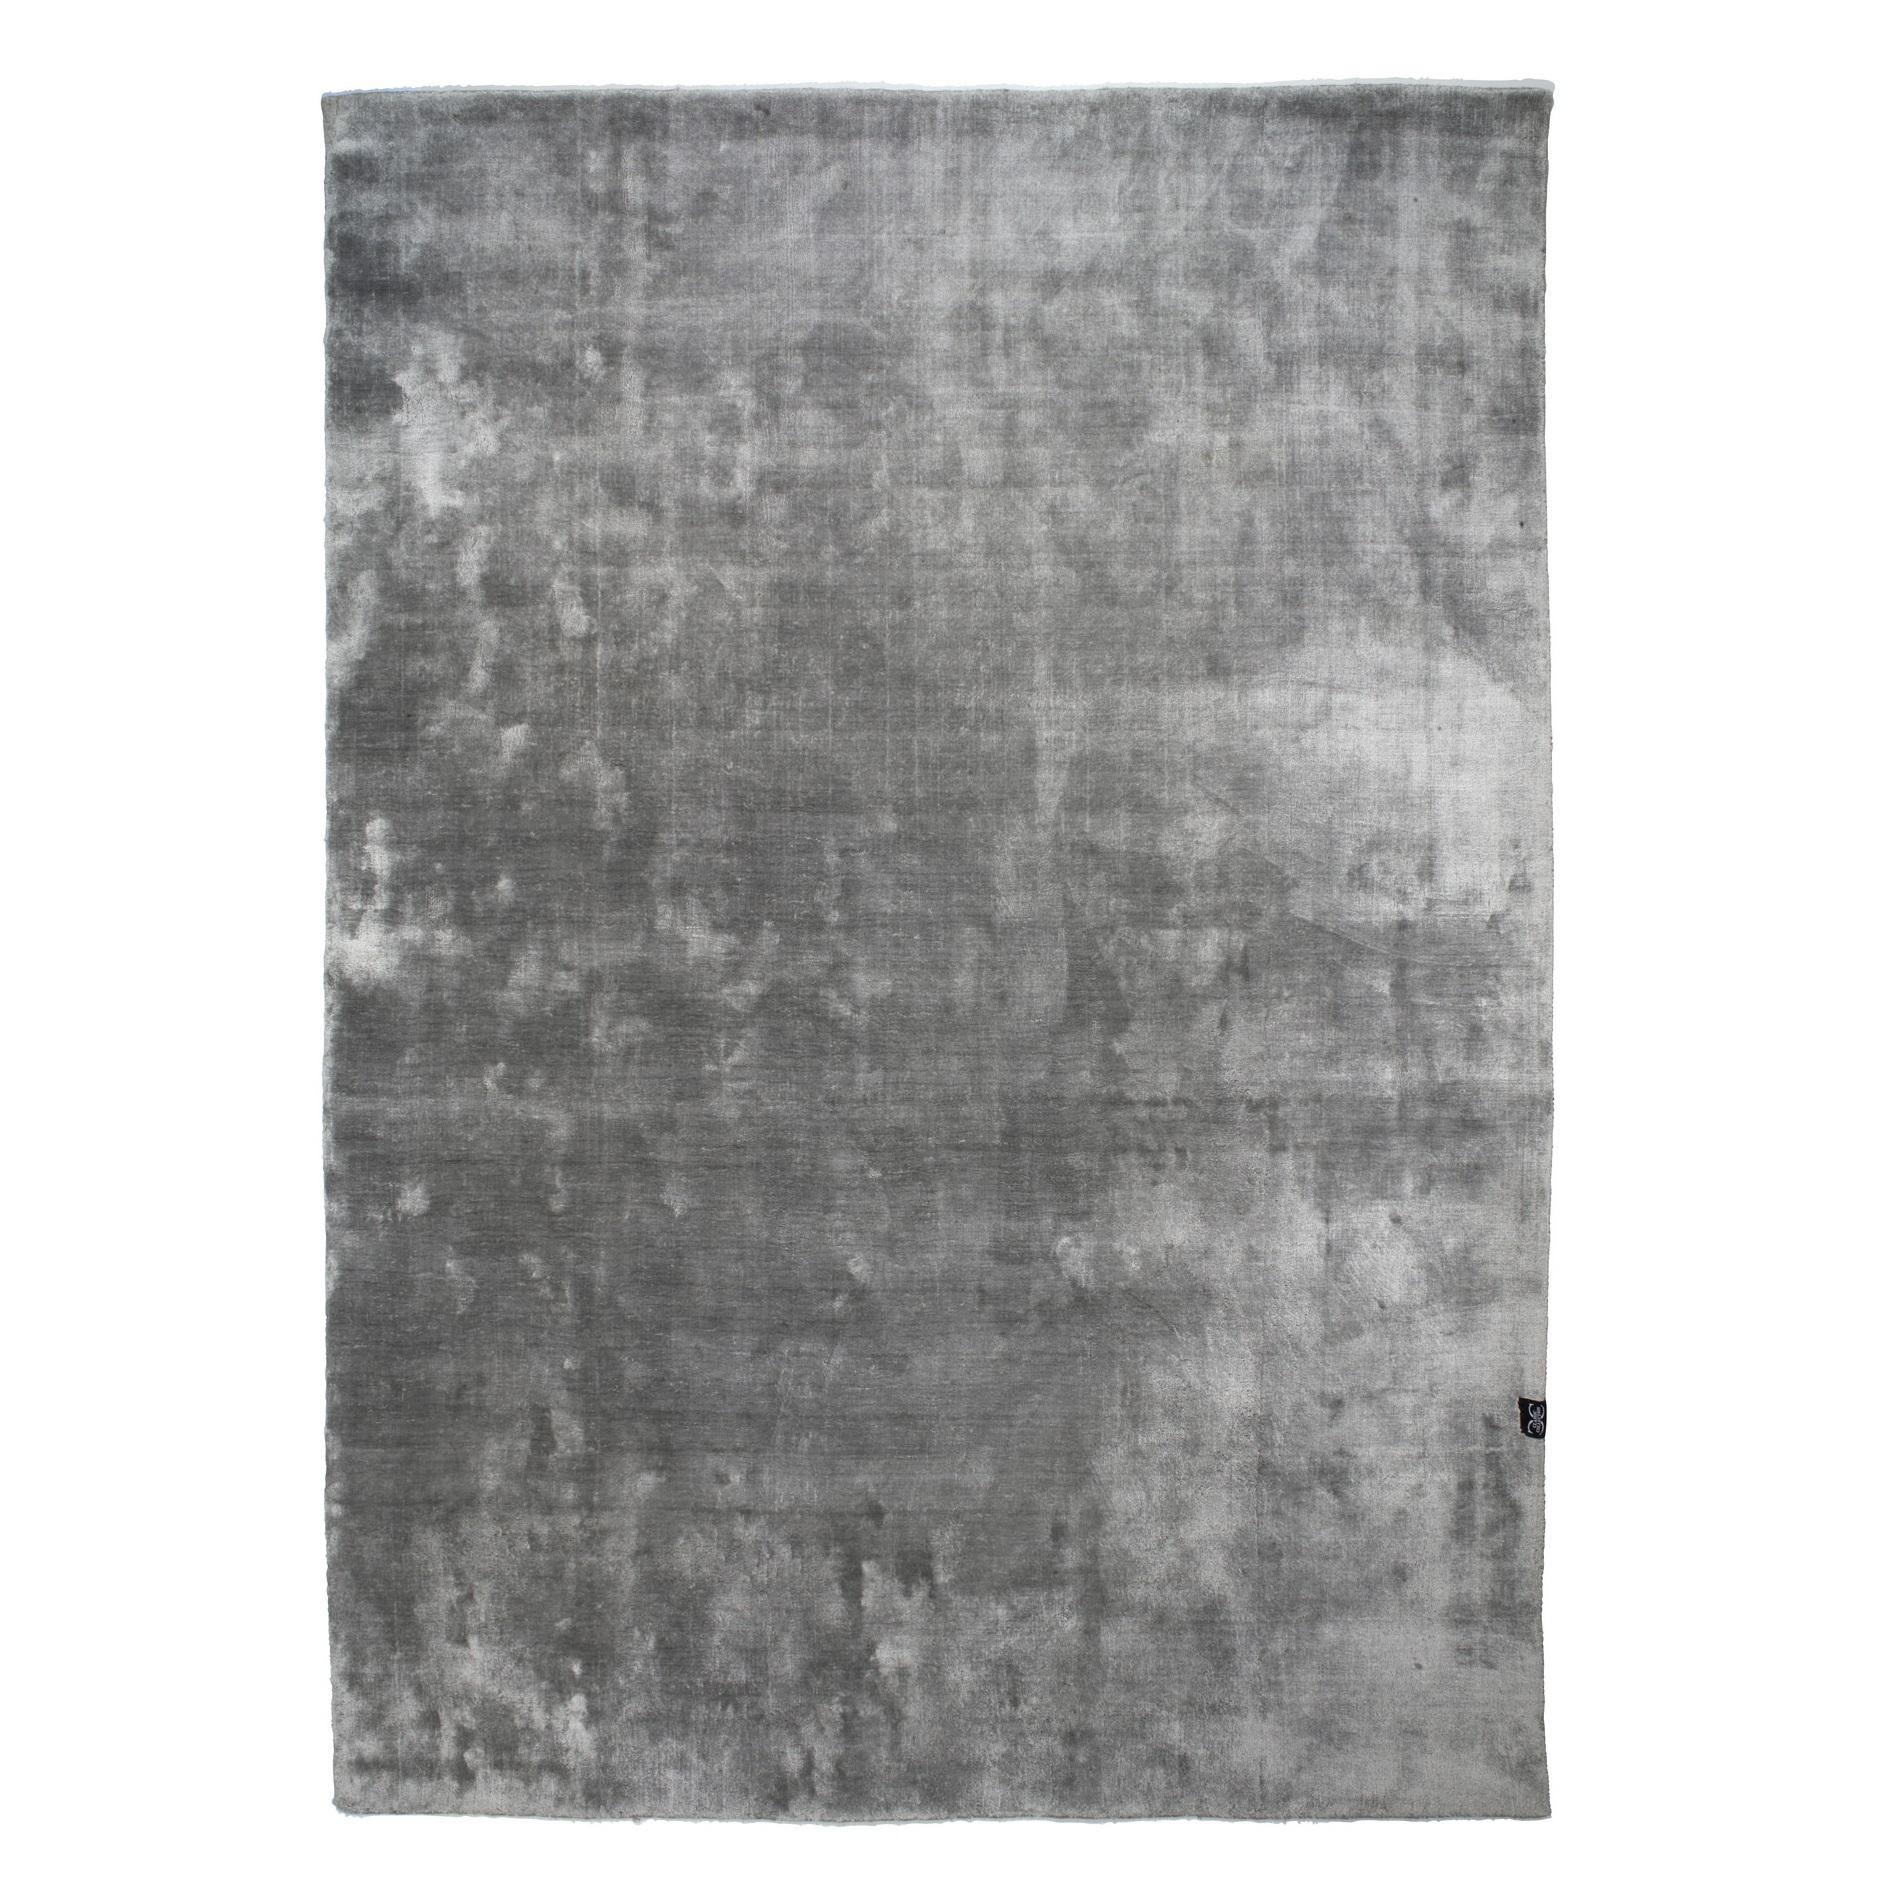 Viskosmatta VELVET TENCEL silver 140 x 200 cm, Classic Collection